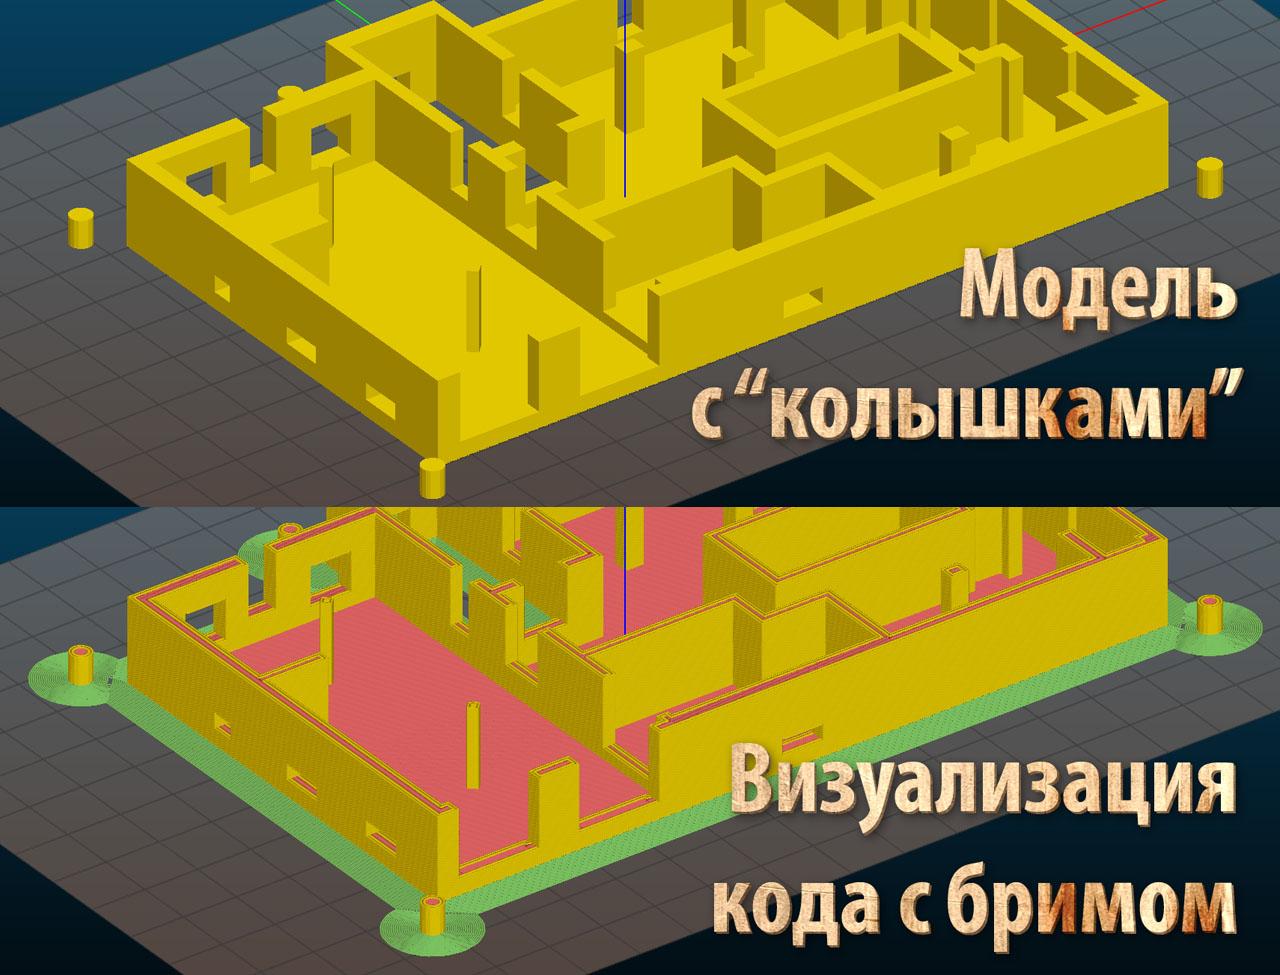 image38.jpeg